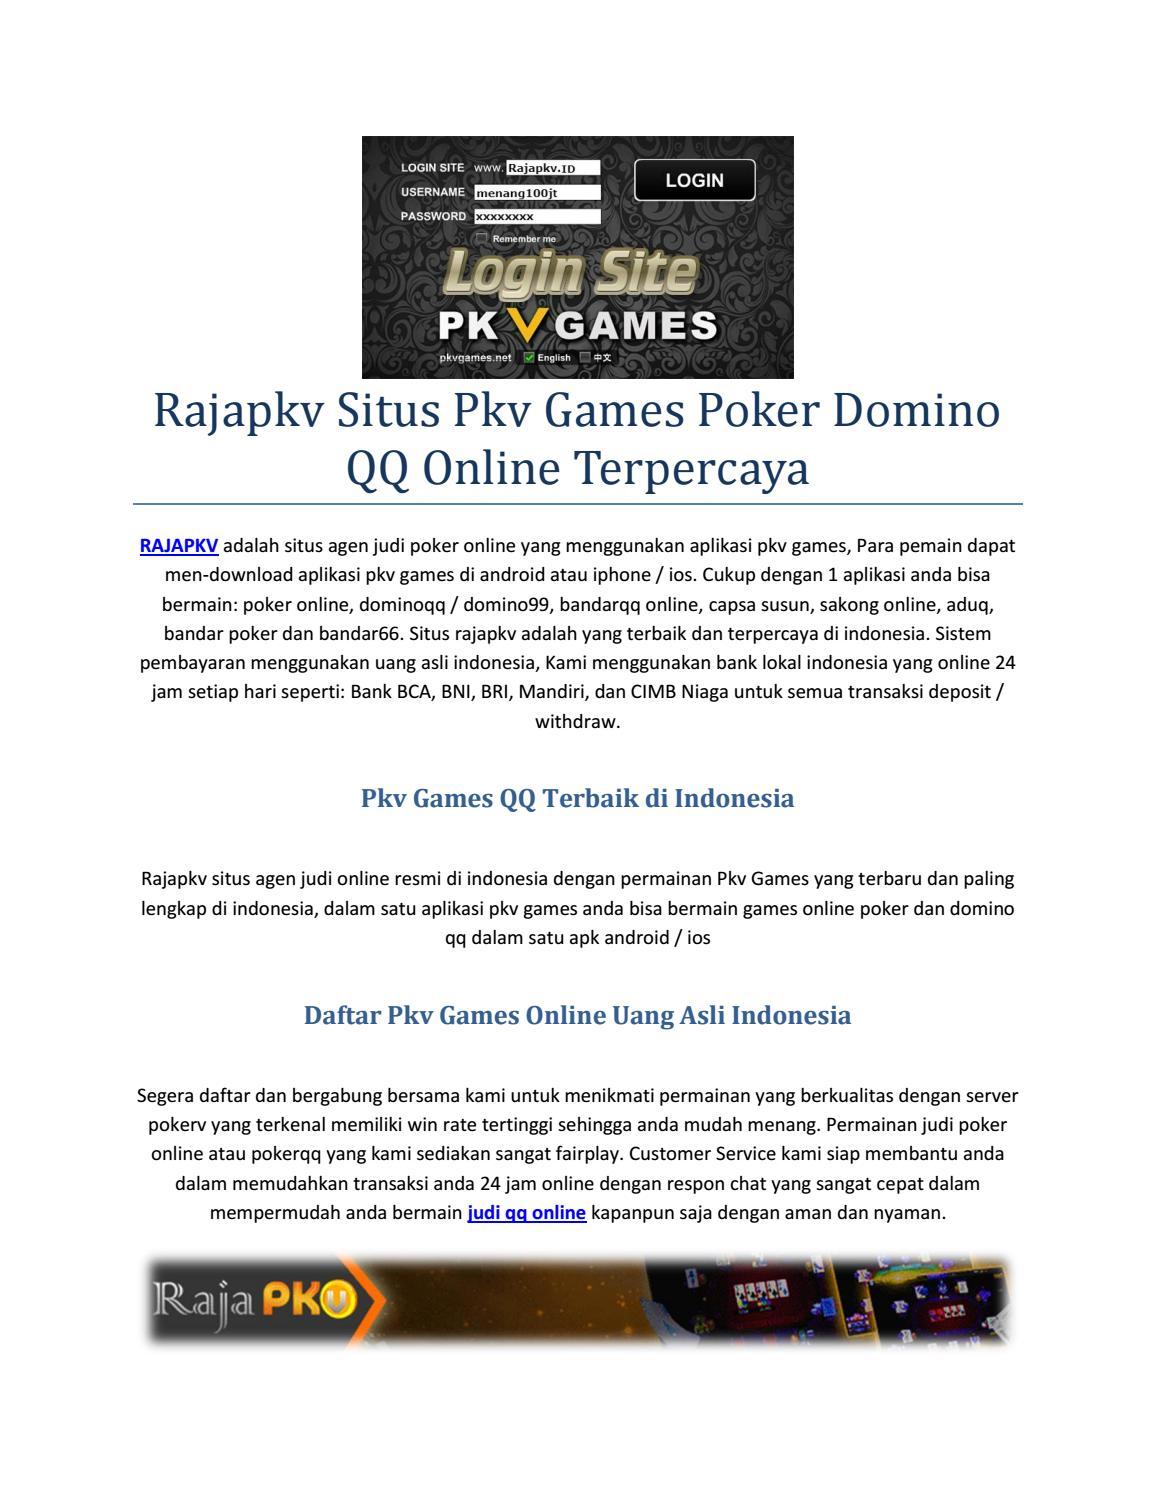 Rajapkv Situs Pkv Games Poker Domino Qq Online Terpercaya By Rajapkv Games Issuu